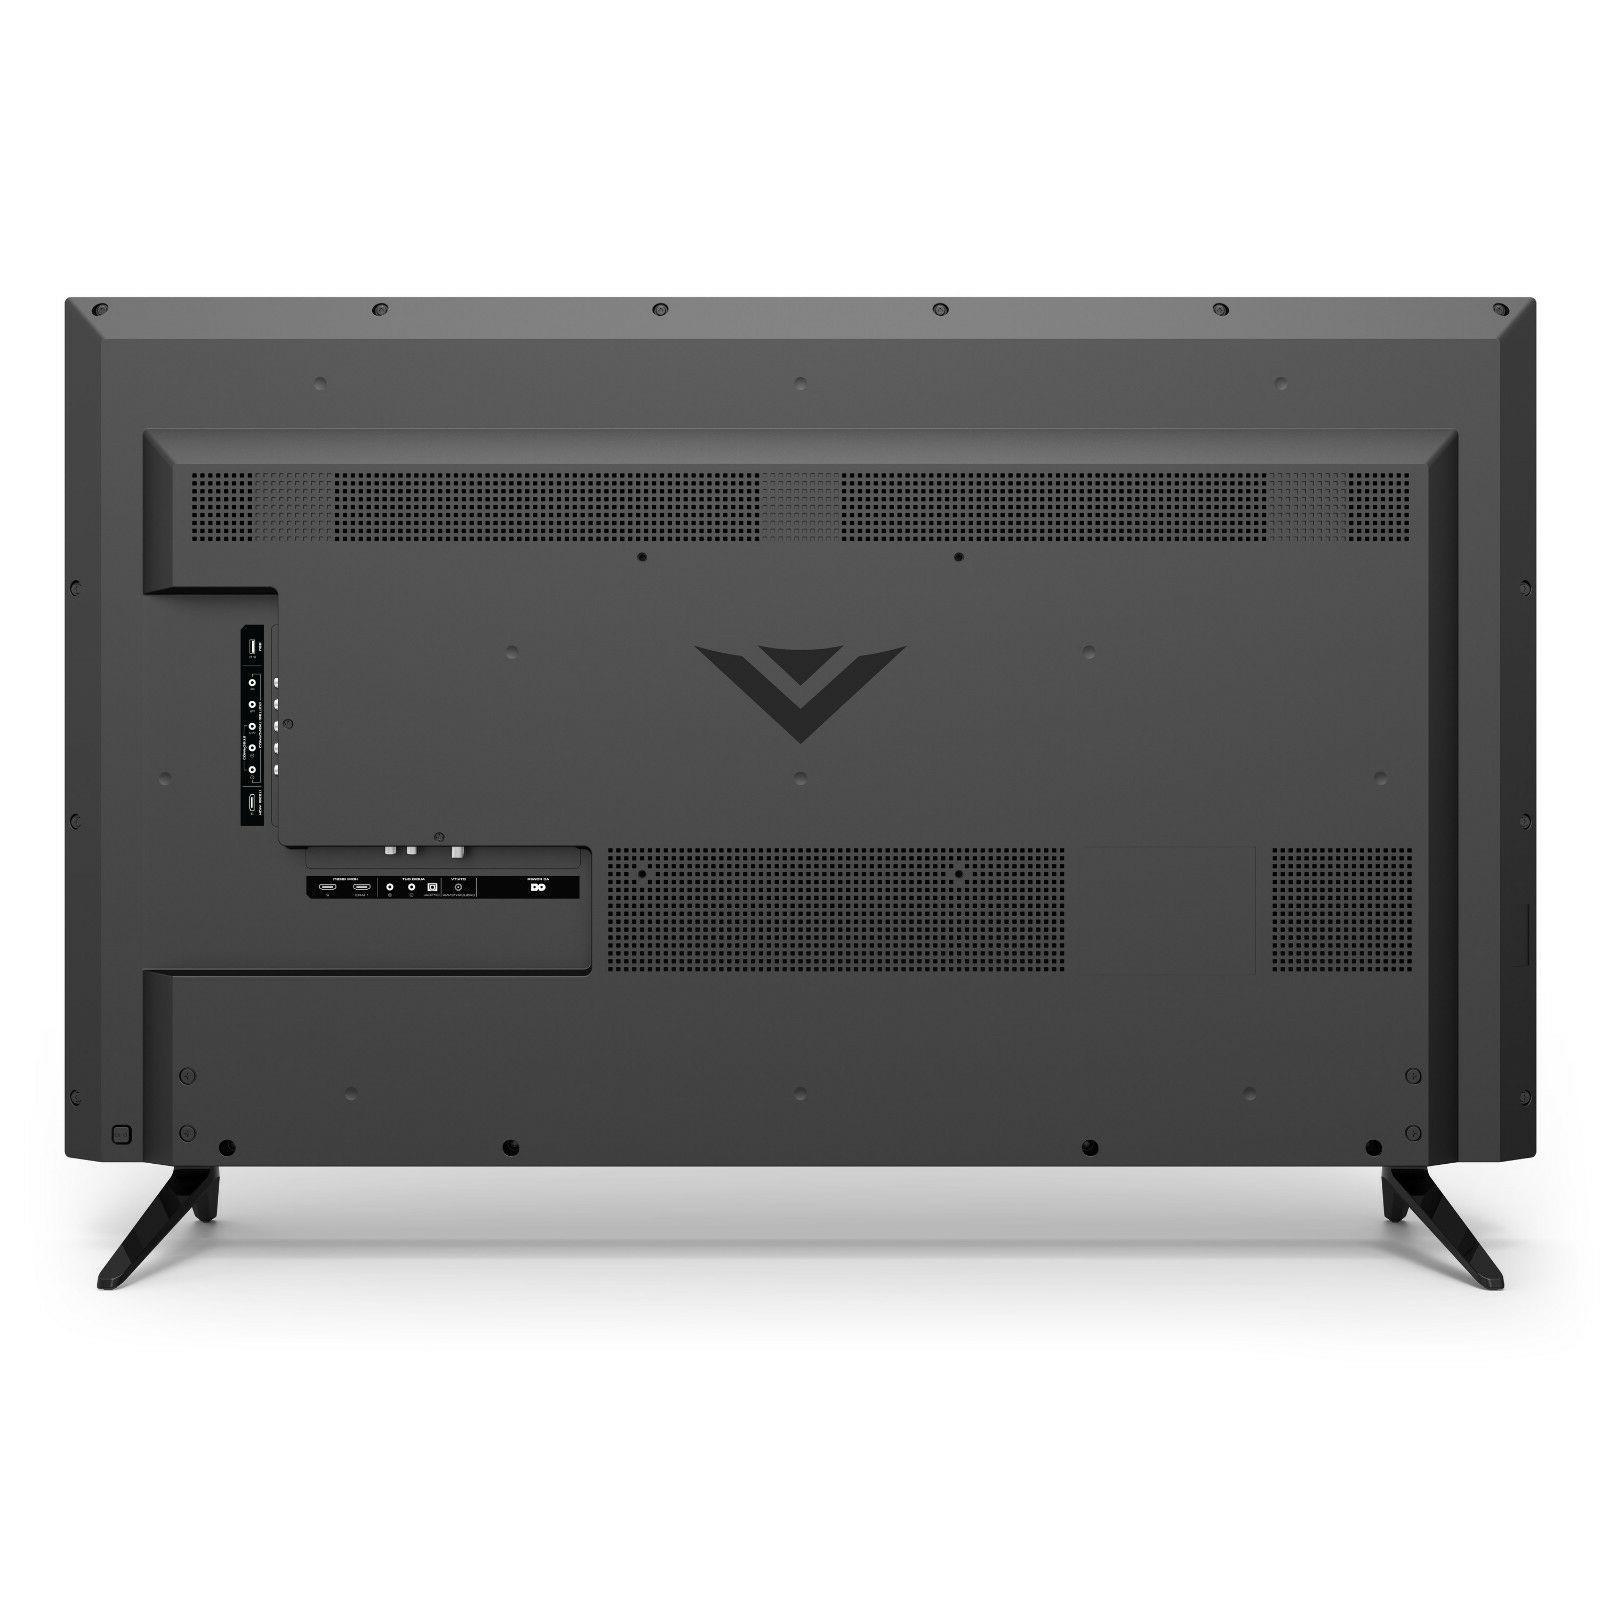 43 LED TV Full Resolution Picture TVs